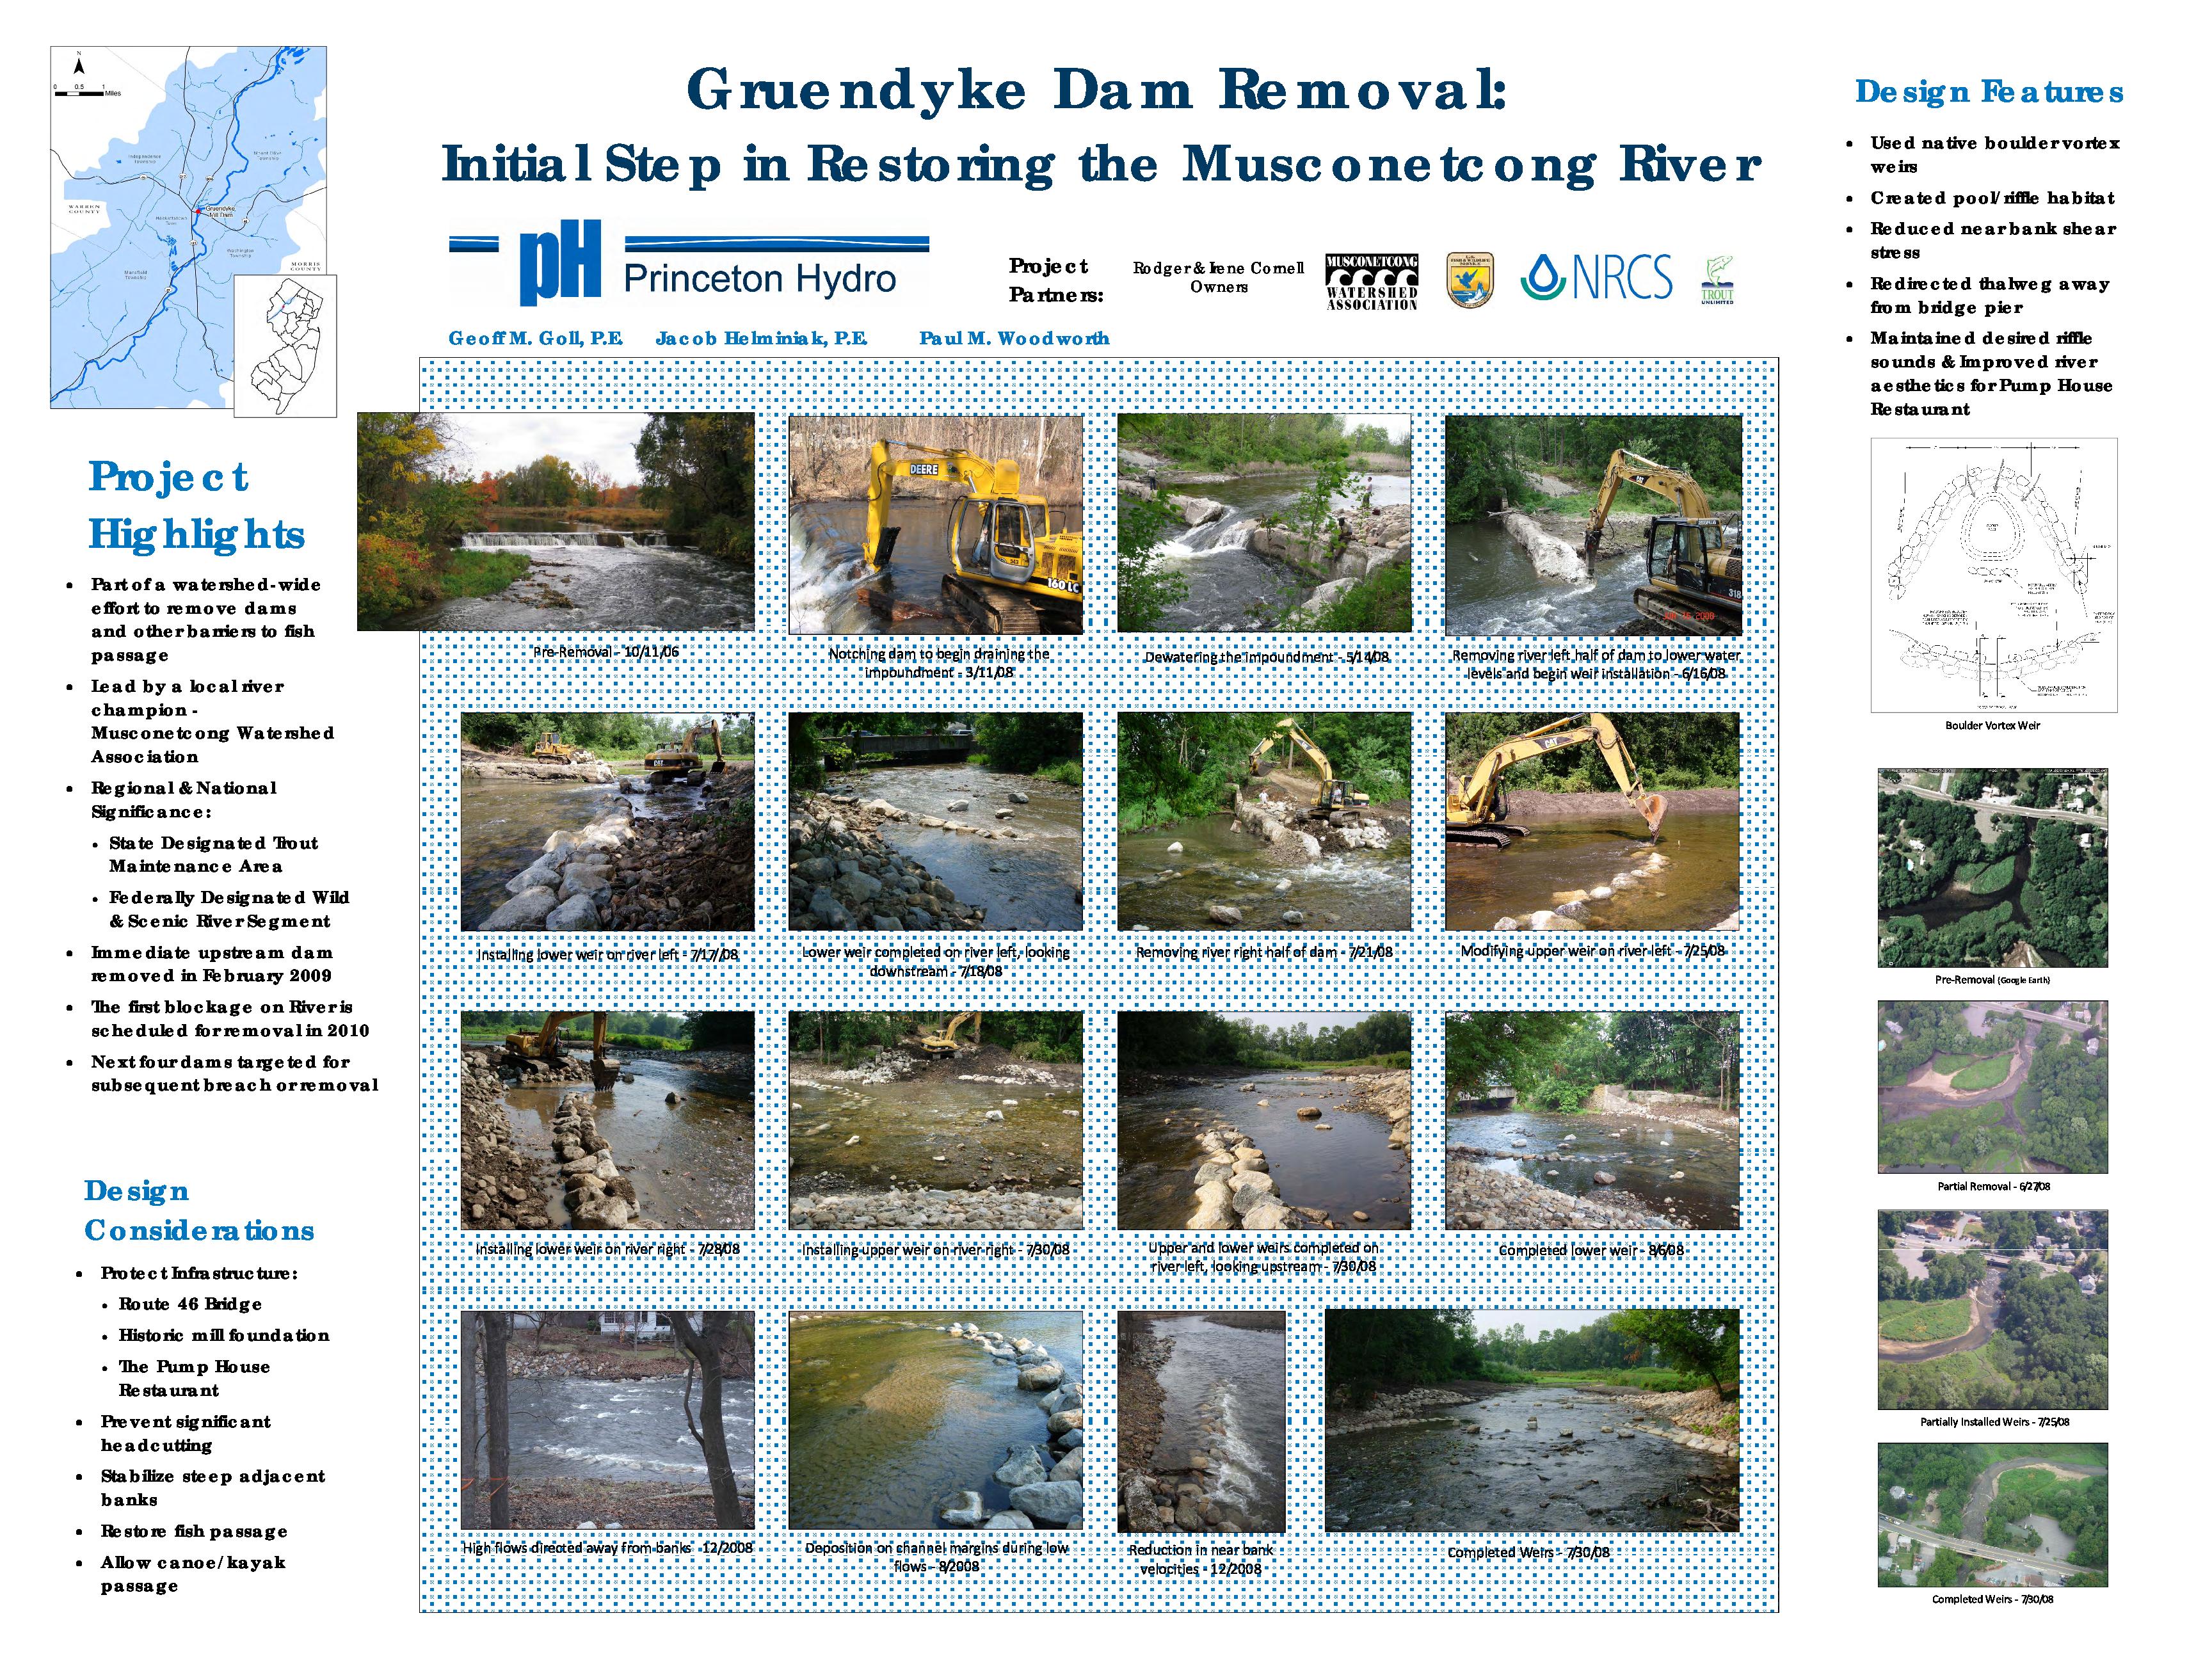 Gruendyke dam removal: Initial steps in restoring Musconetcong River